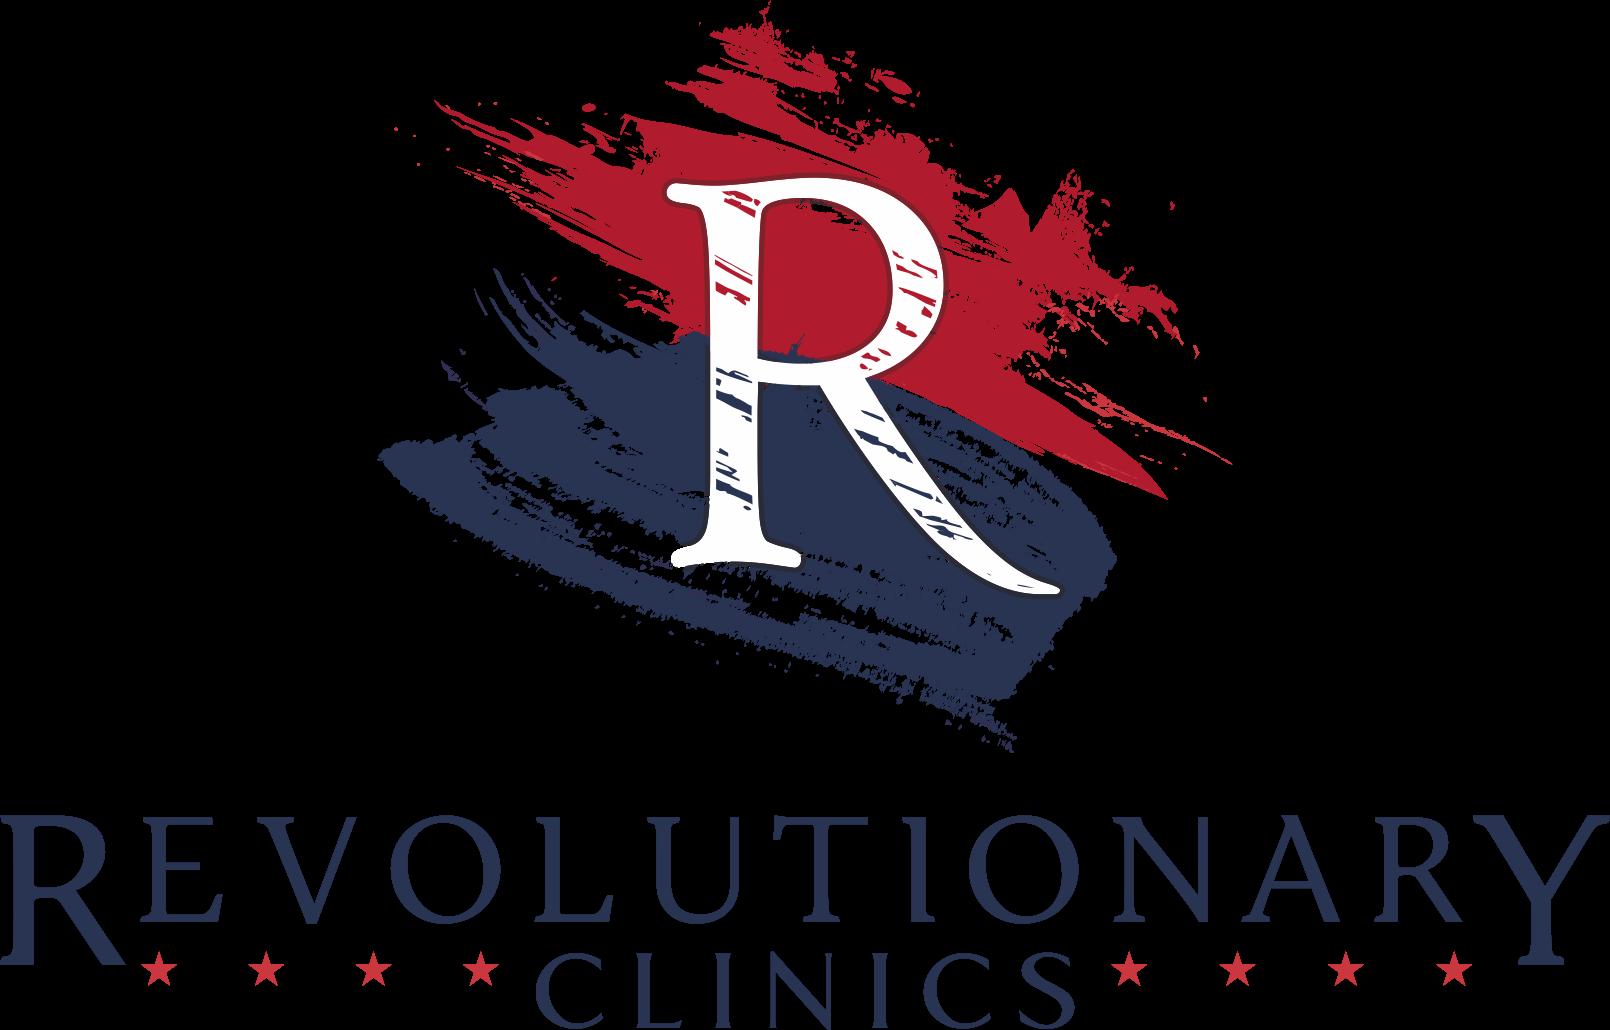 revolutionary clinics of massachusetts.p